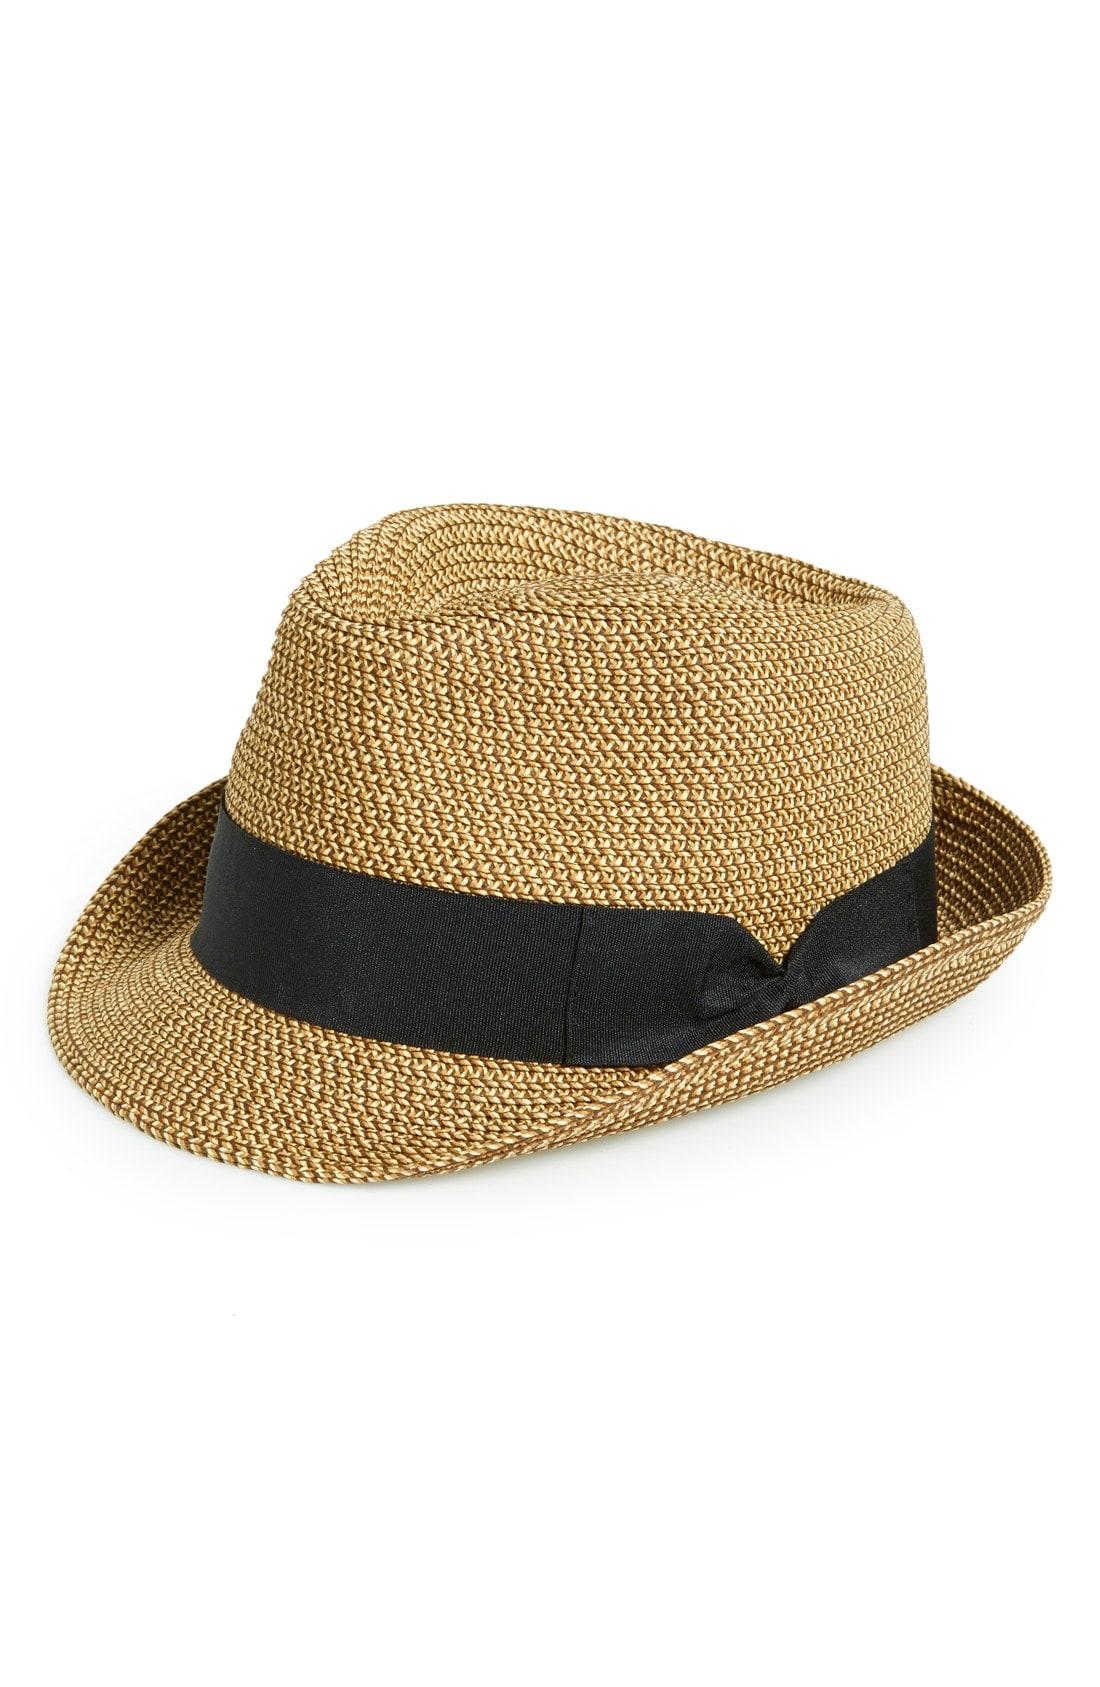 Women's Sun & Straw Hats | Nordstrom